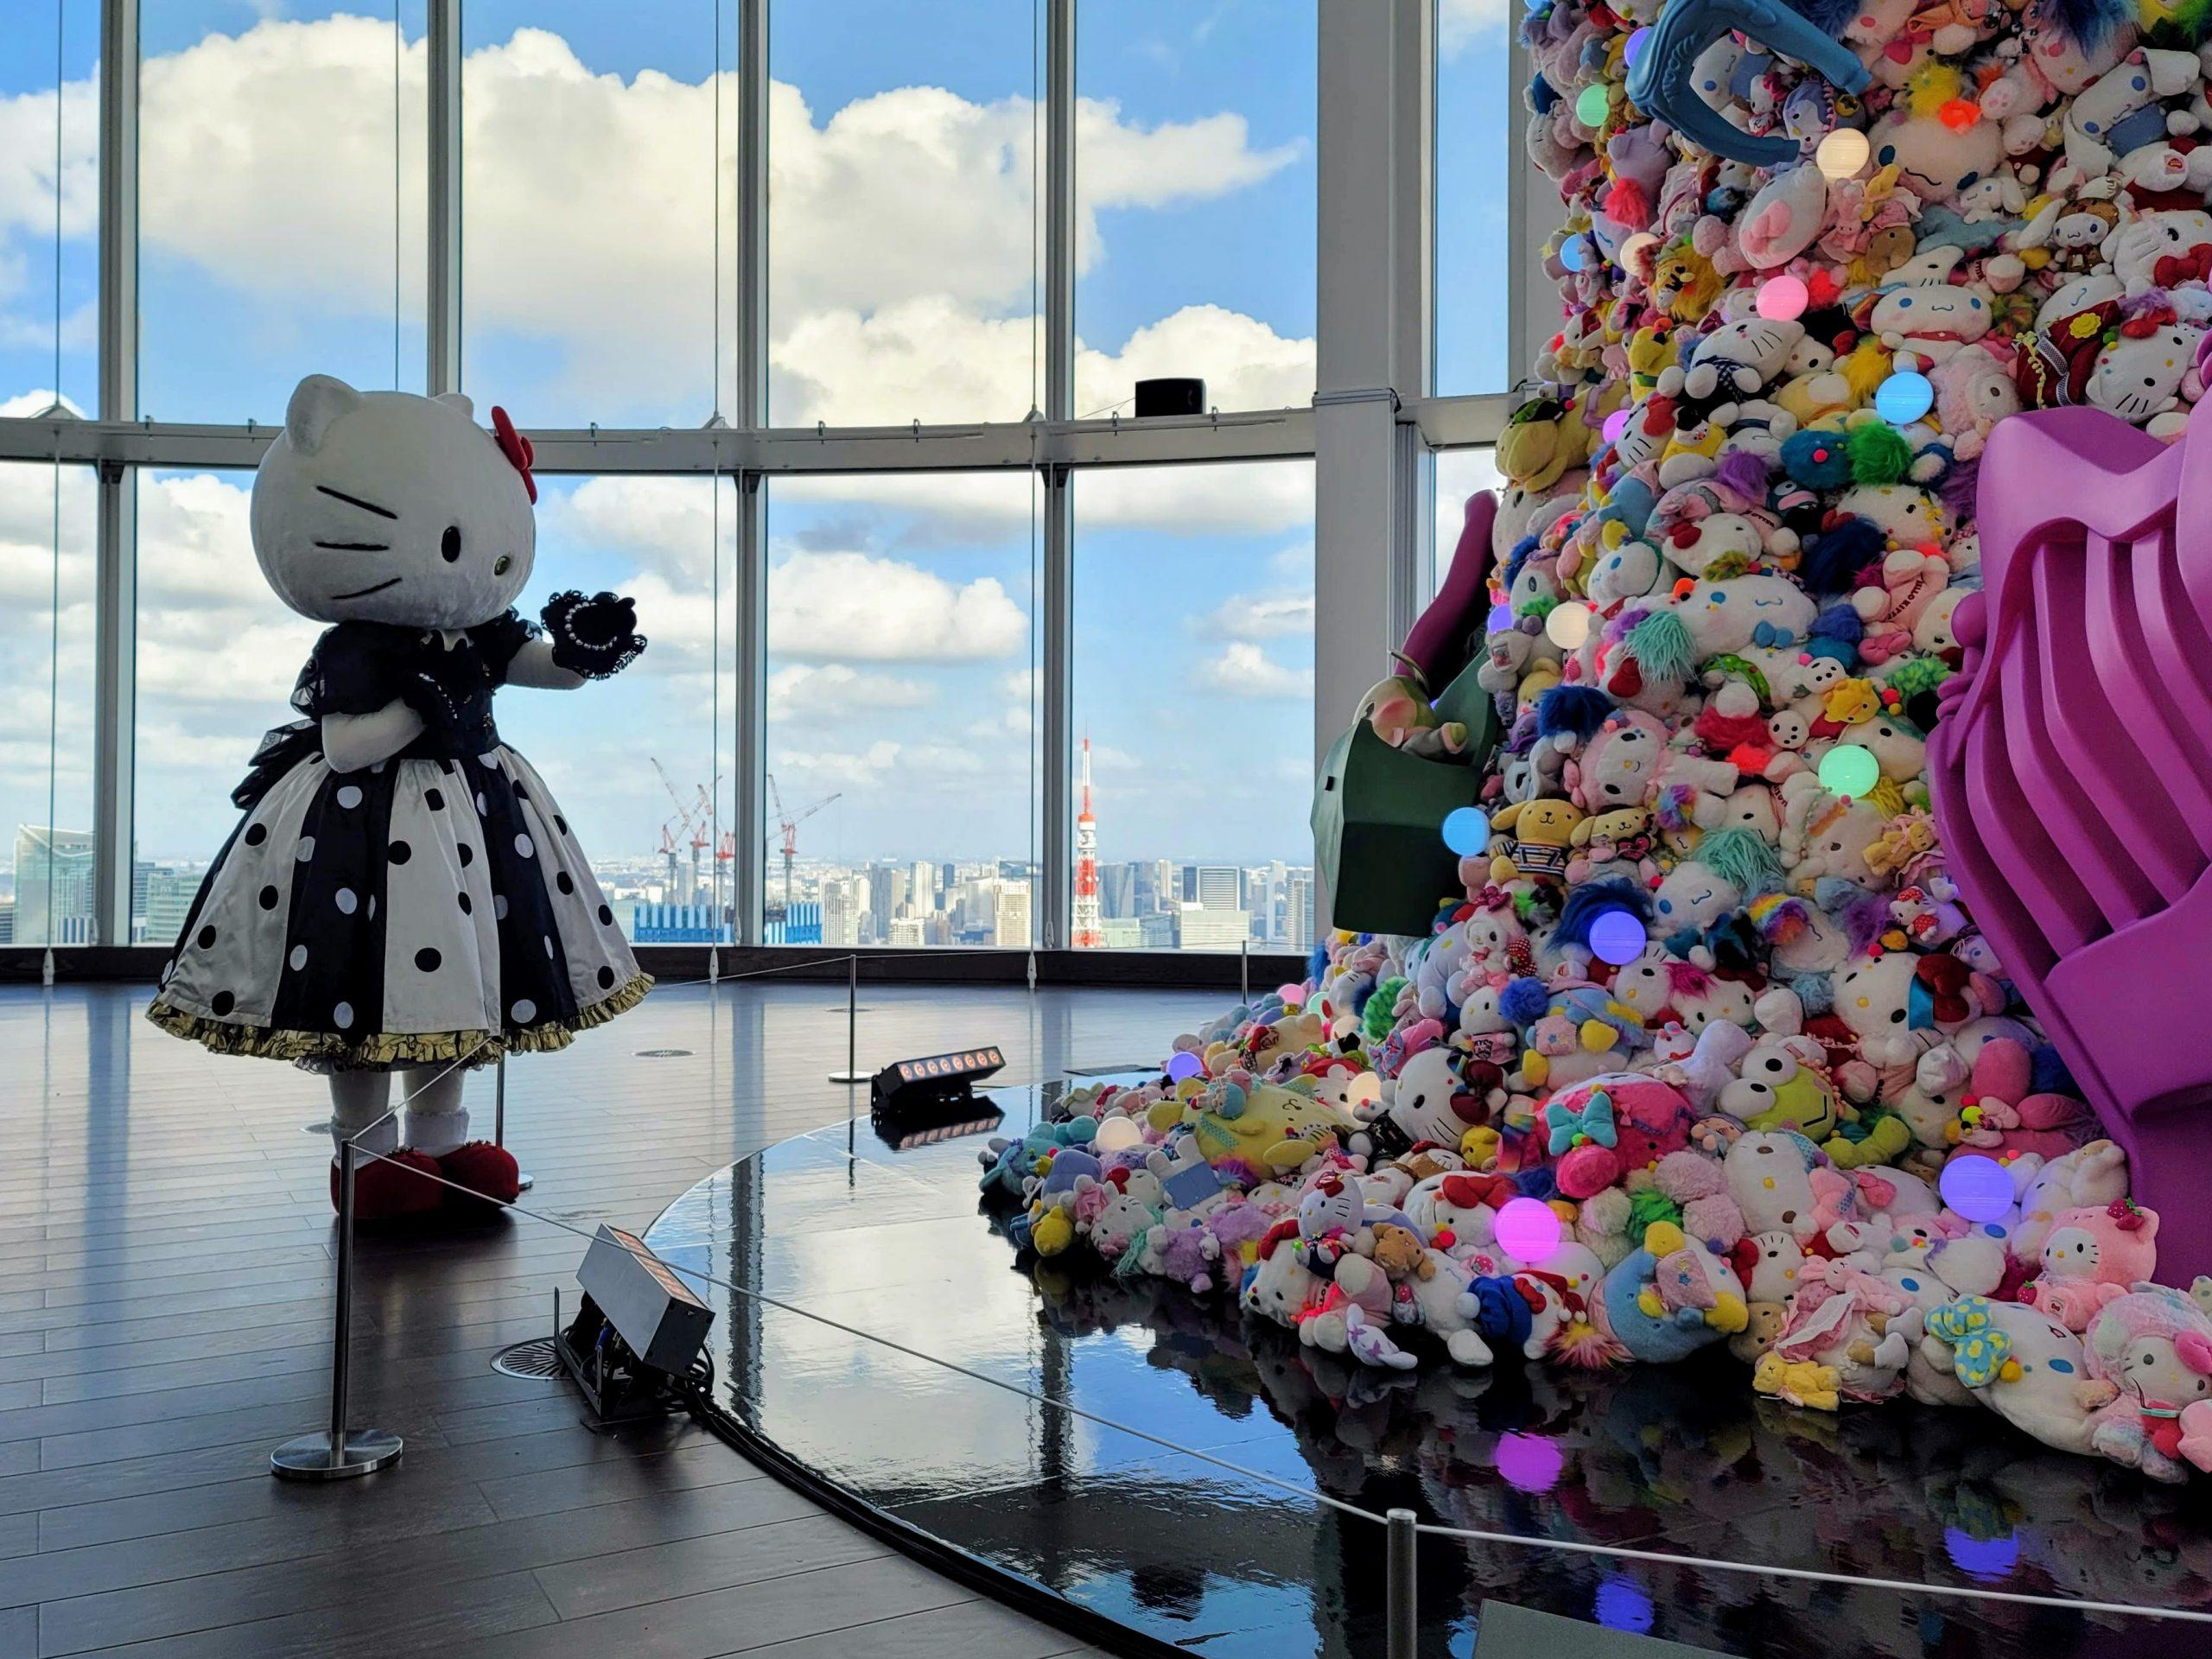 60TH ANNIVERSARY SANRIO EXHIBITION THE BEGINNING OF KAWAII Exhibition at Tokyo City View Roppongi Hills